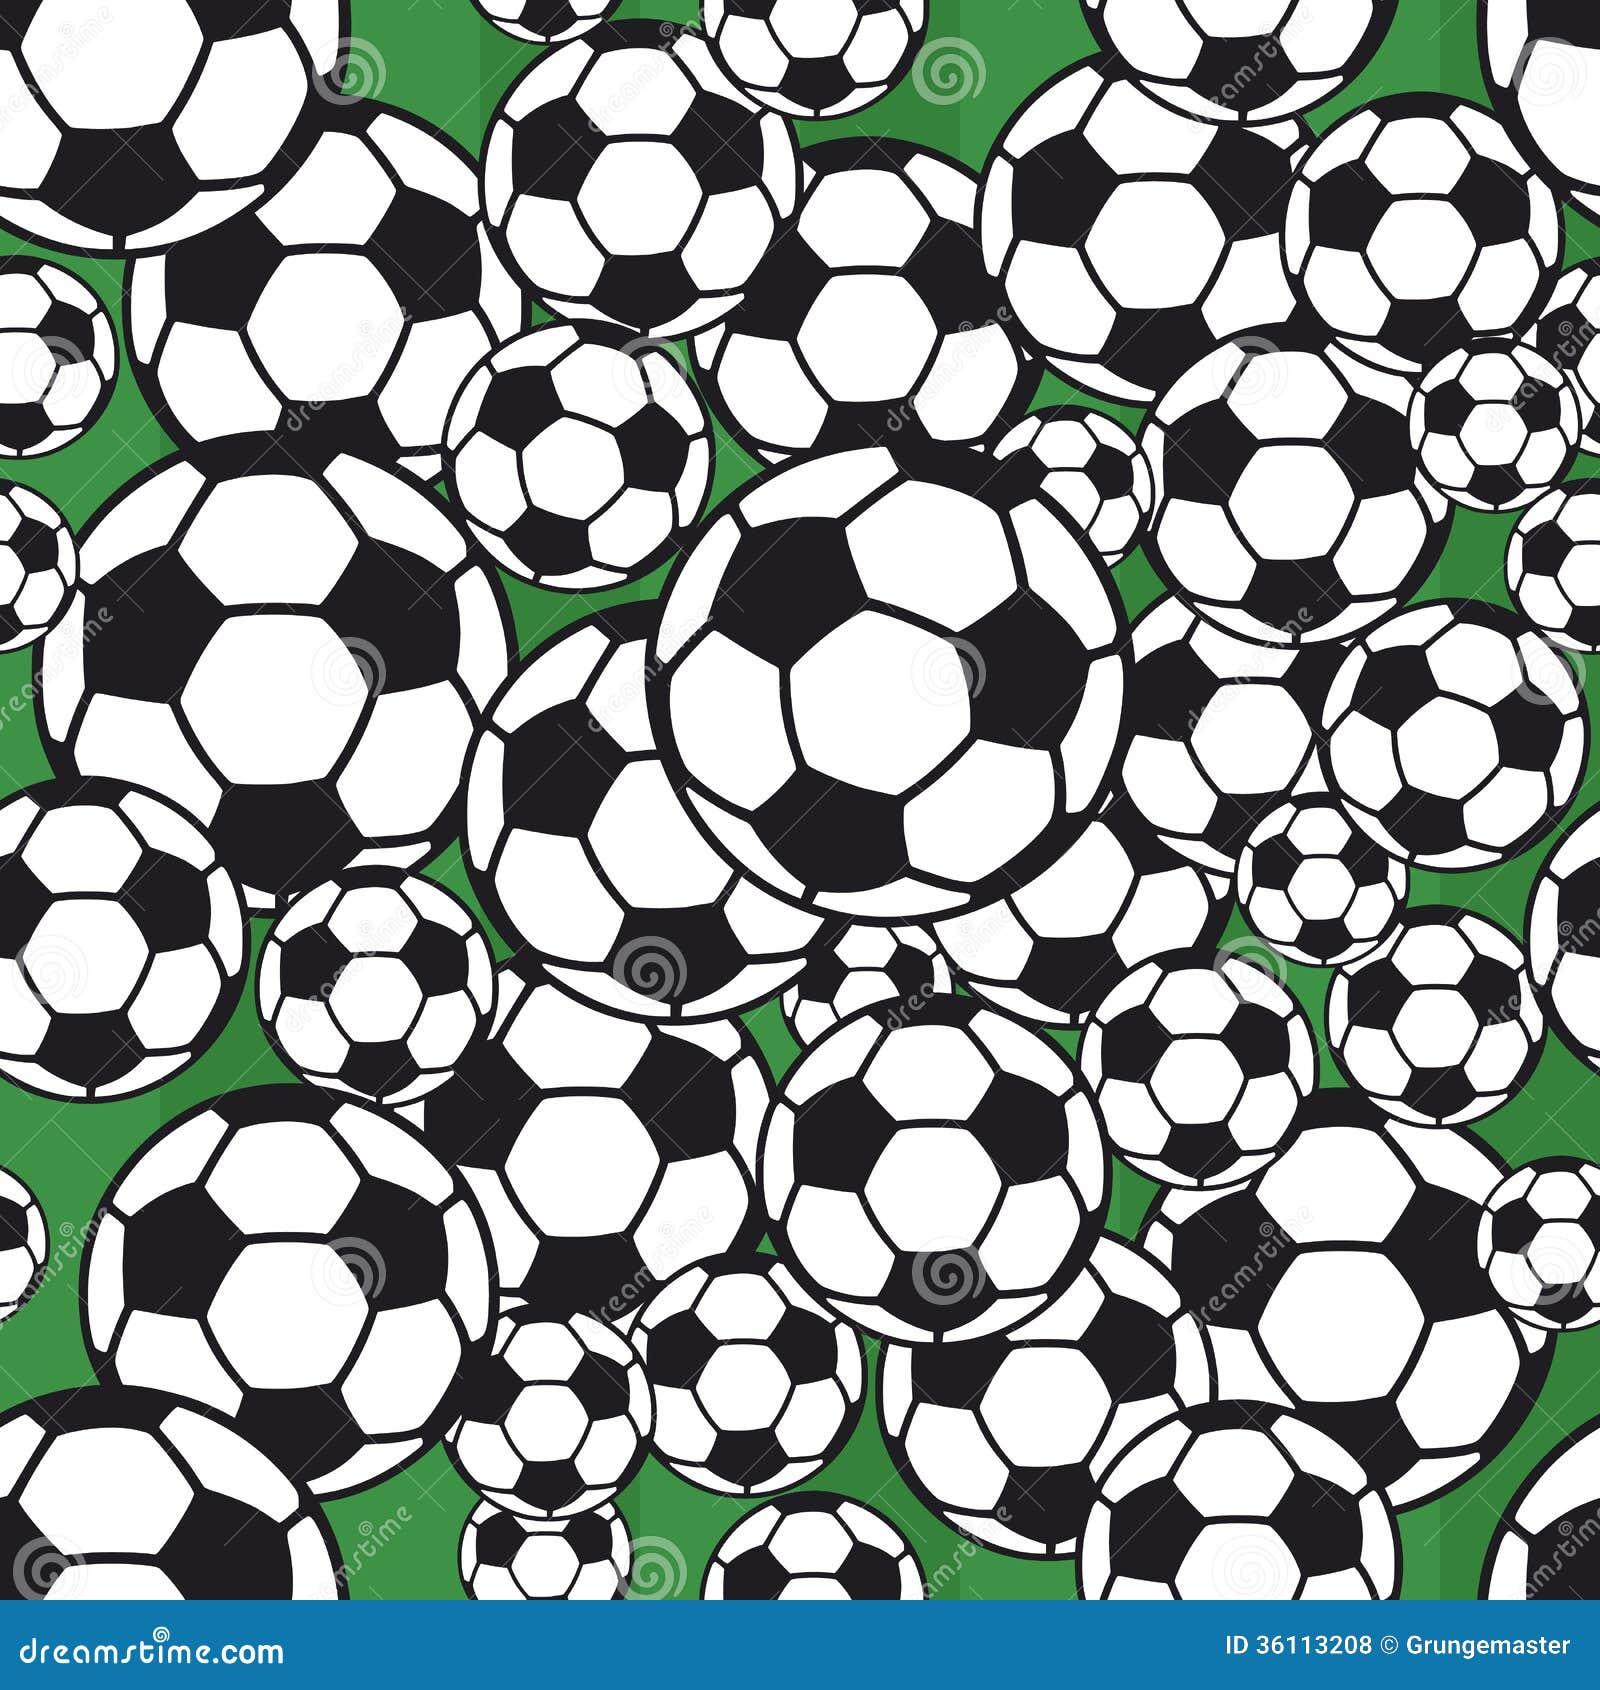 printable soccer ball patterns patterns kid